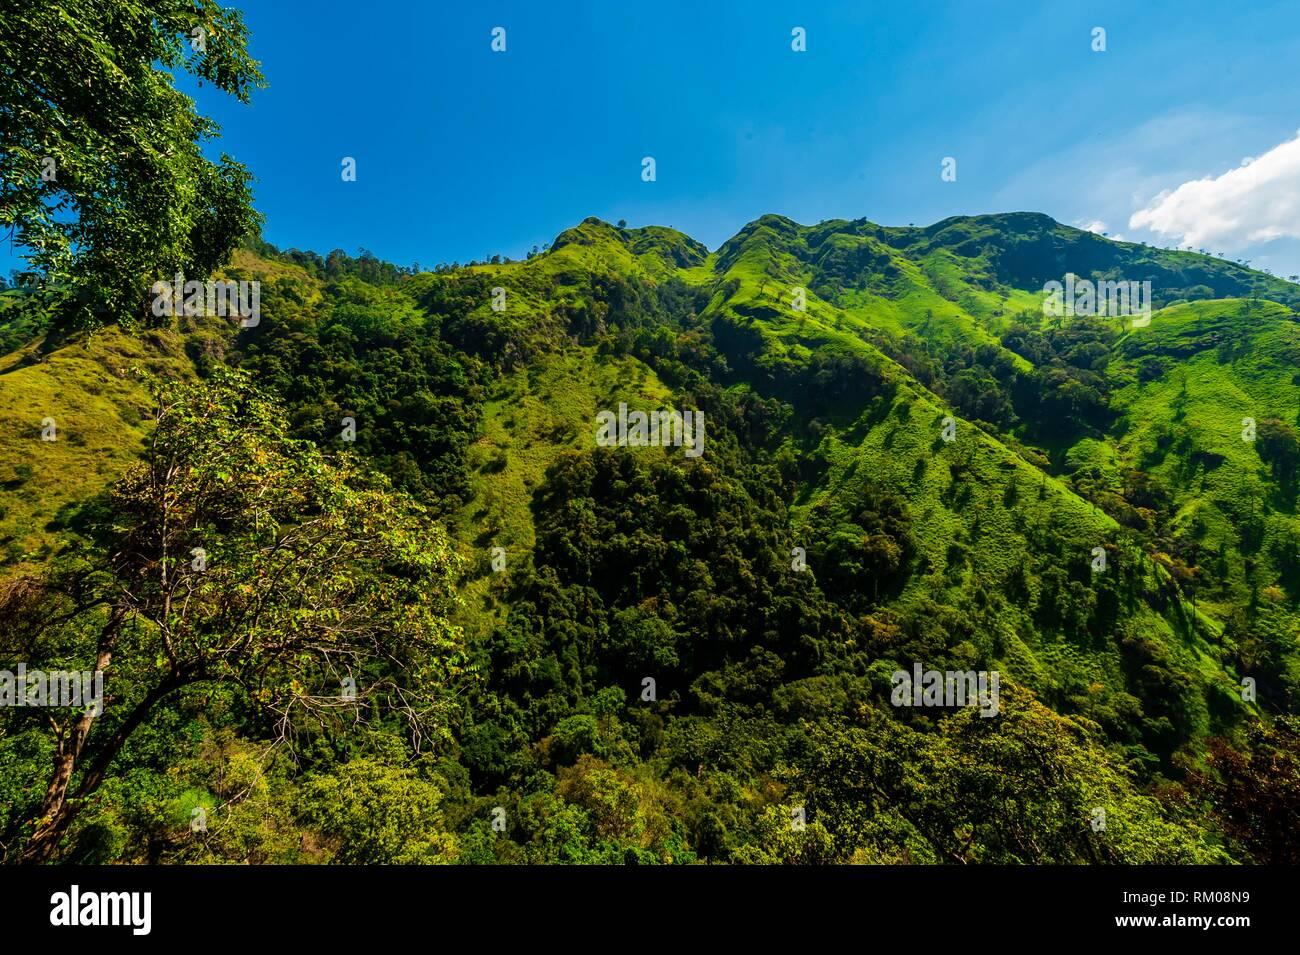 Ella Gap, Ambagollapathana, near Ella, Uva Province, Sri Lanka. - Stock Image